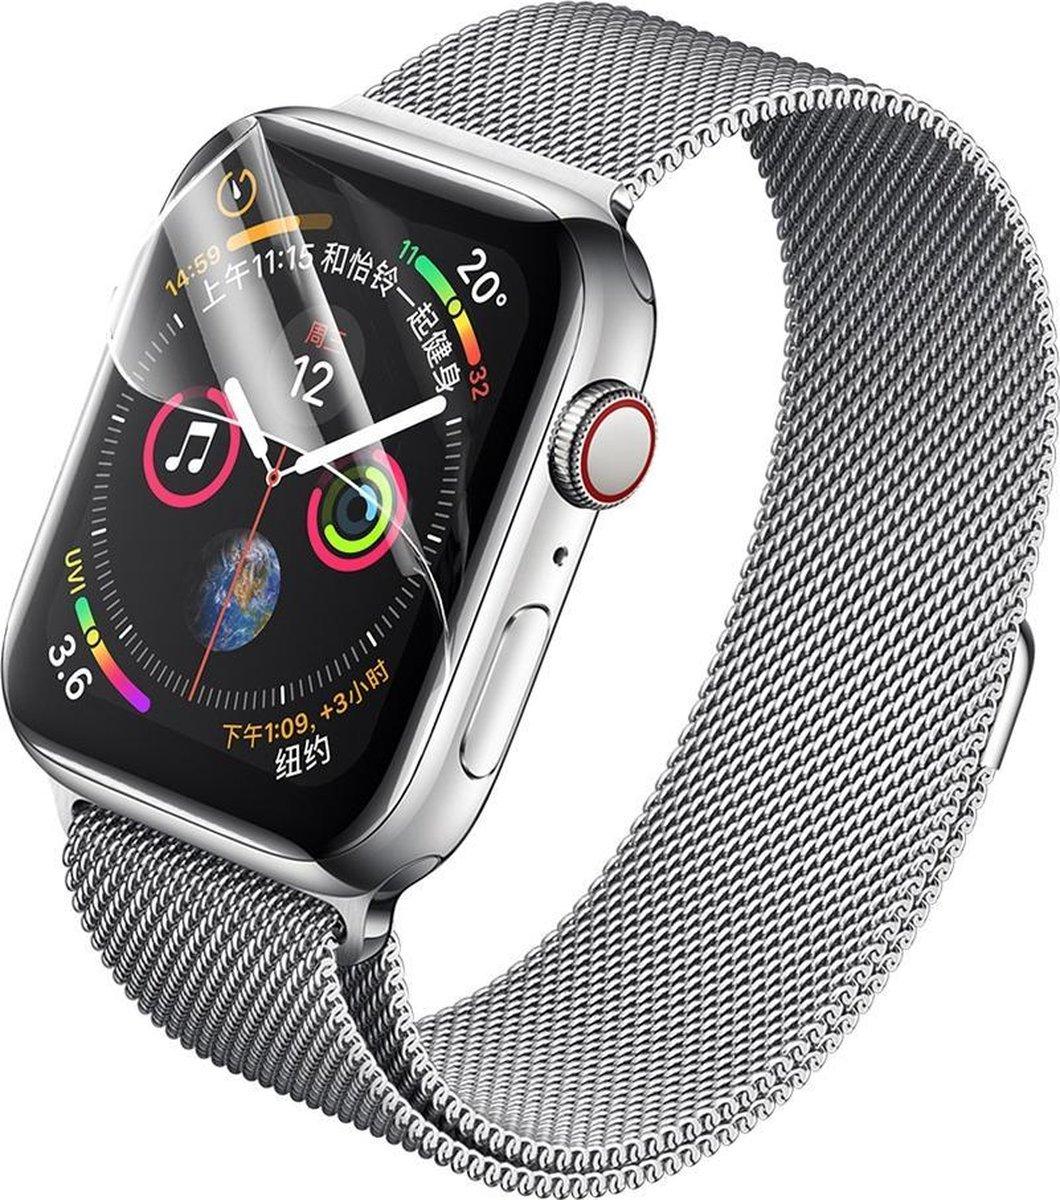 2x Stuks Apple iWatch 4/5/6/SE (44 mm) Hydrogel Bescherm Folie - Glasfolie Bescherming - Screenprote